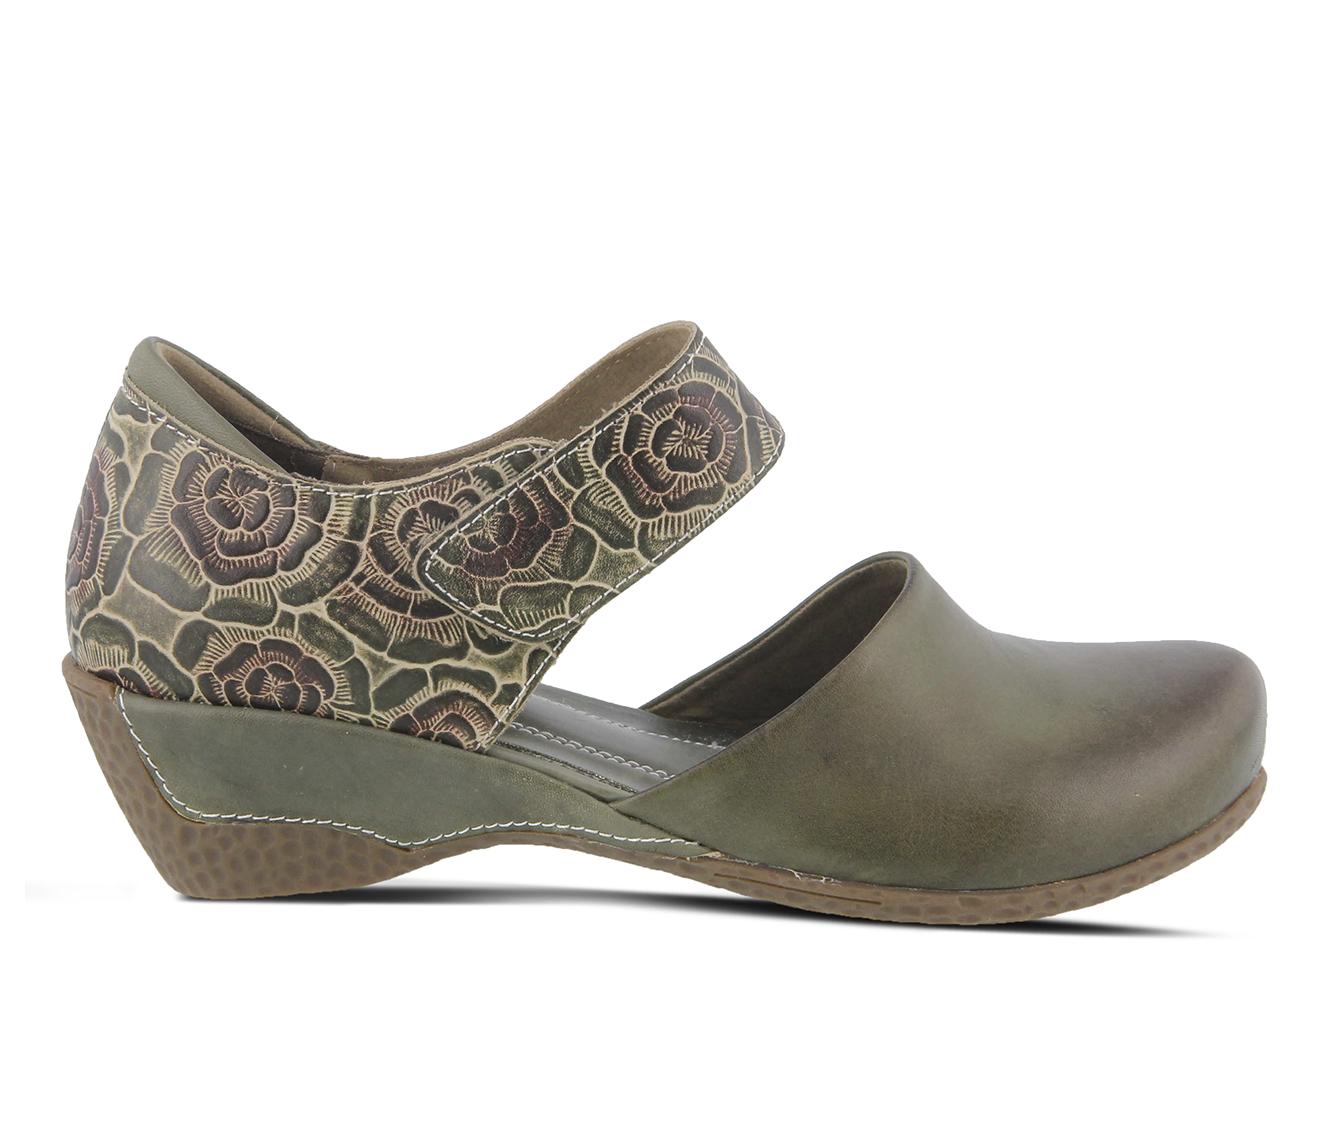 L'Artiste Gloss-Pansy Women's Shoe (Green Leather)